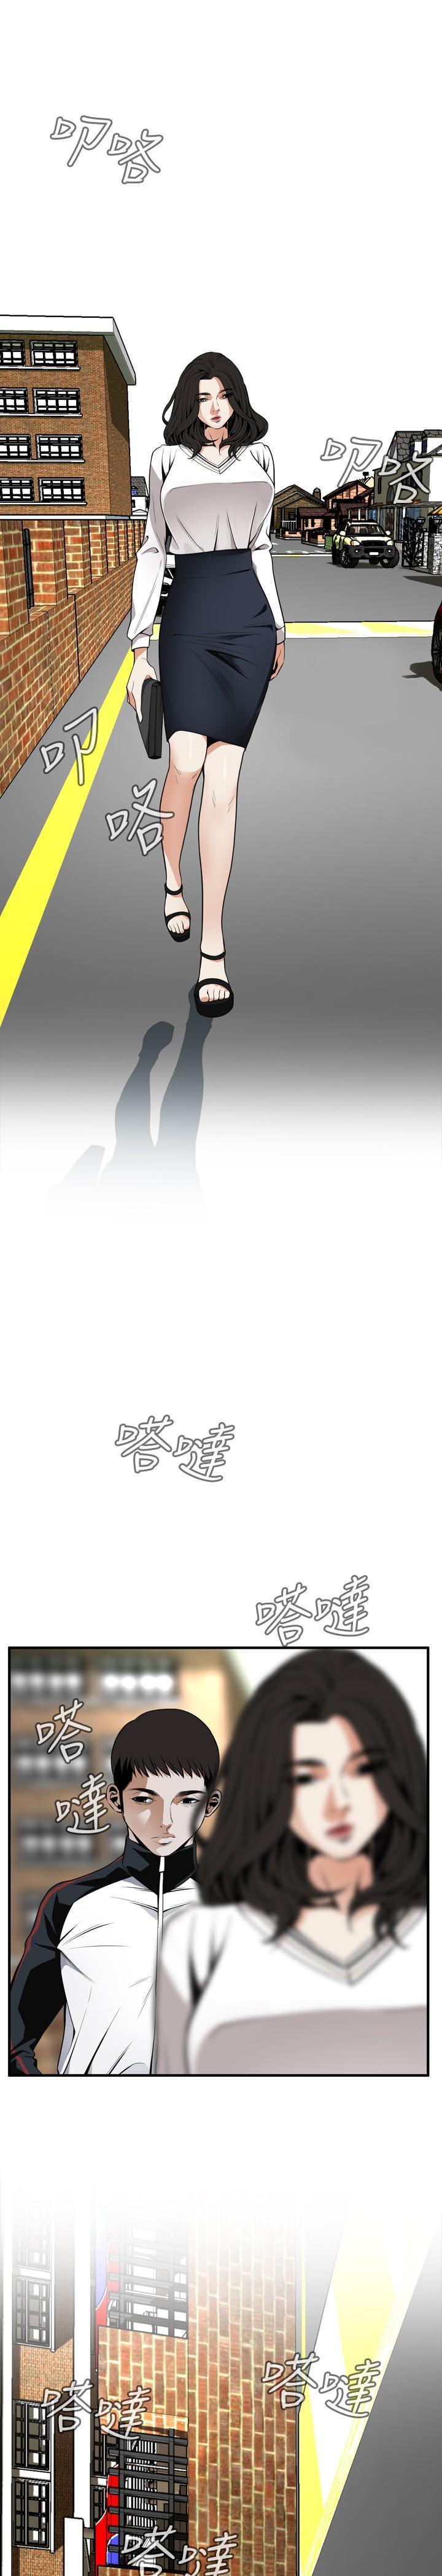 Take a Peek 偷窥 Ch.39~60 [Chinese]中文 92